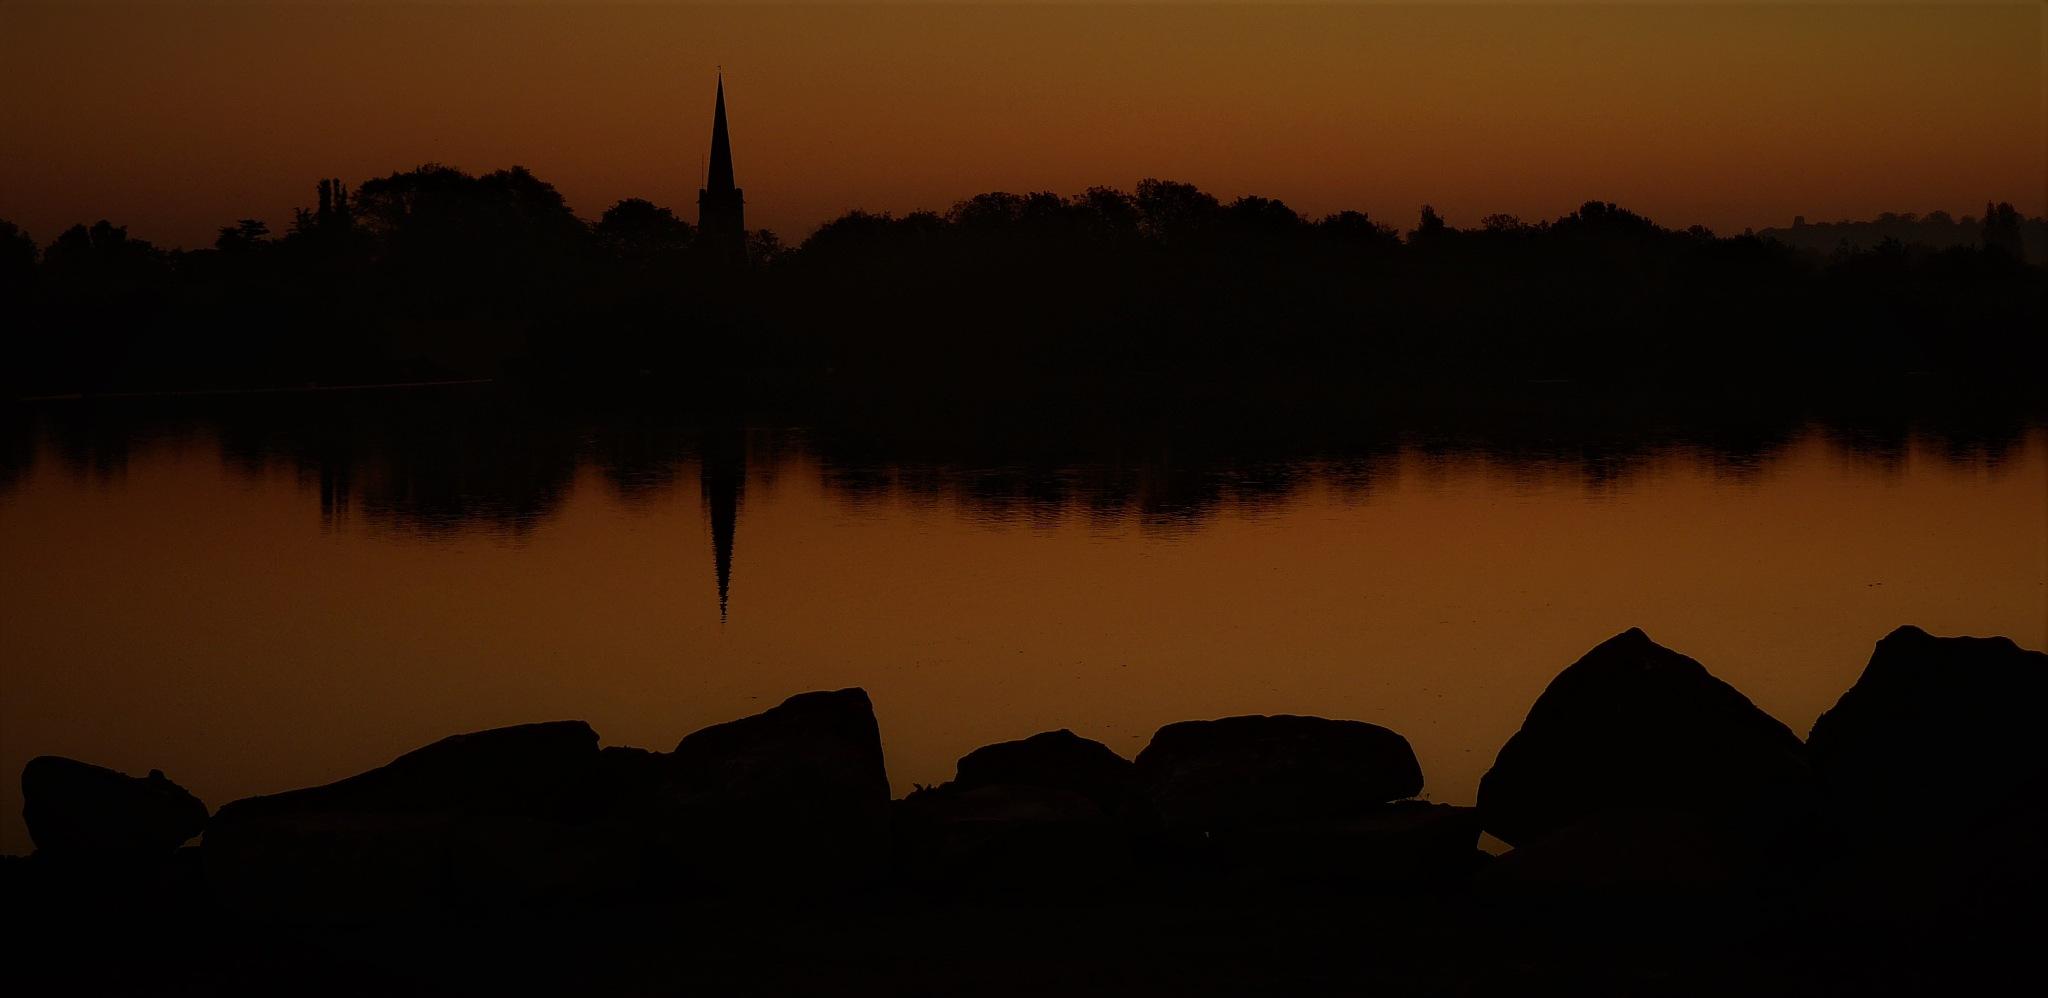 Evening church by AJ Yakstrangler Andy Jamieson